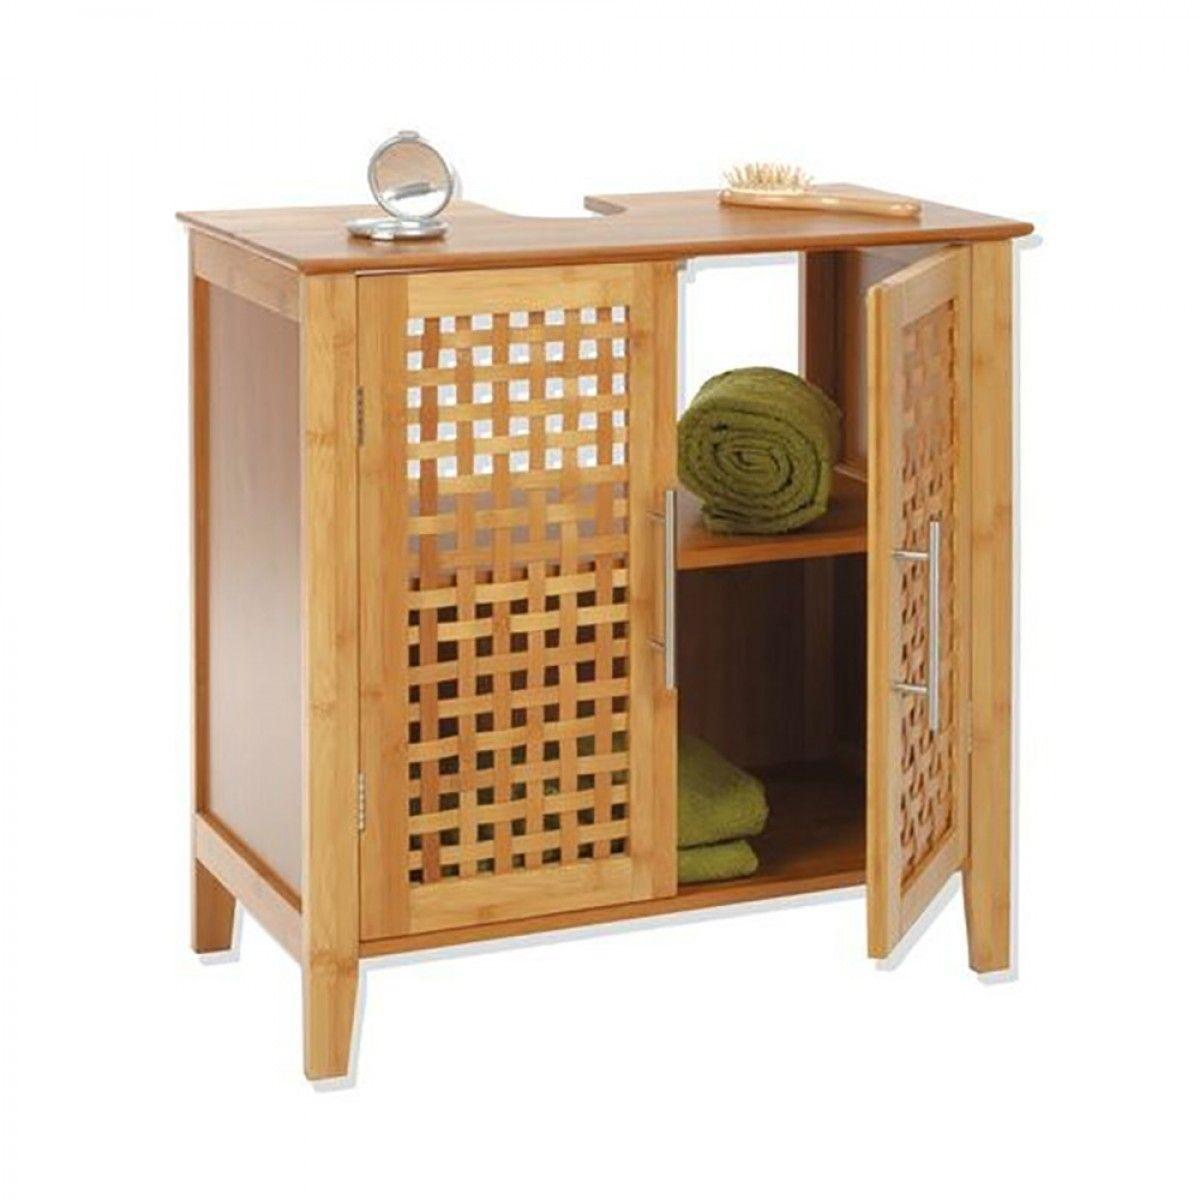 Meuble Dessous De Lavabo Bambou Deco Salle De Bain Meuble Sous